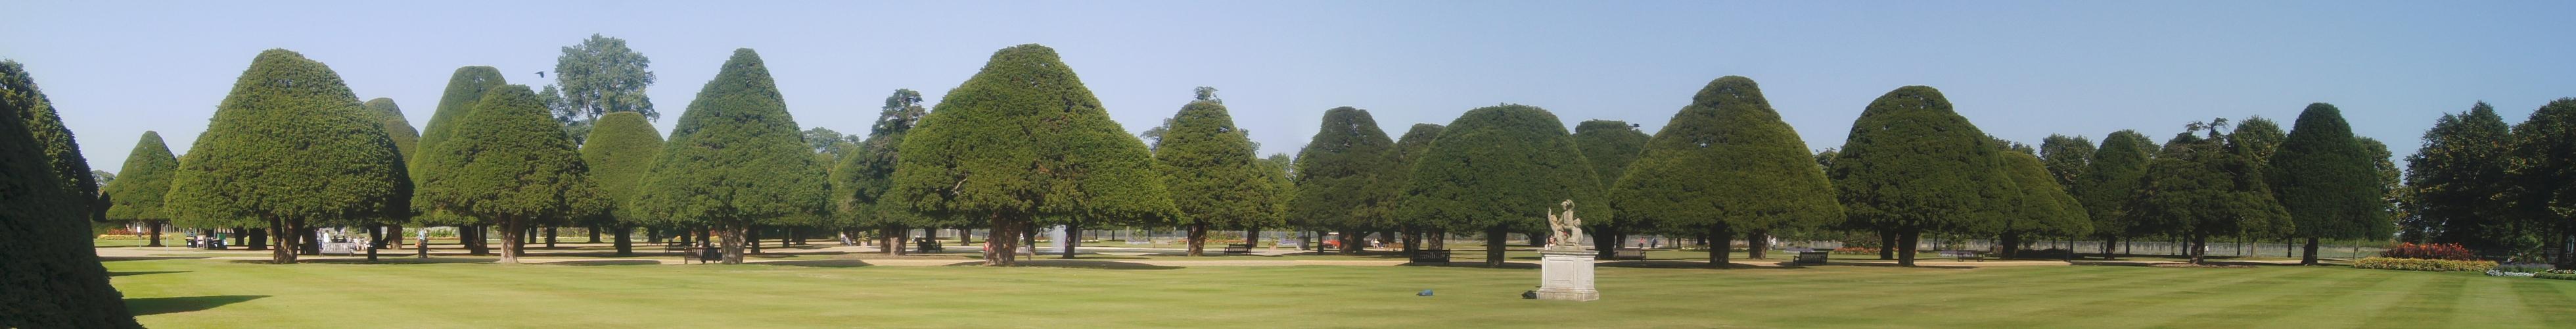 Panorama Photo Trees